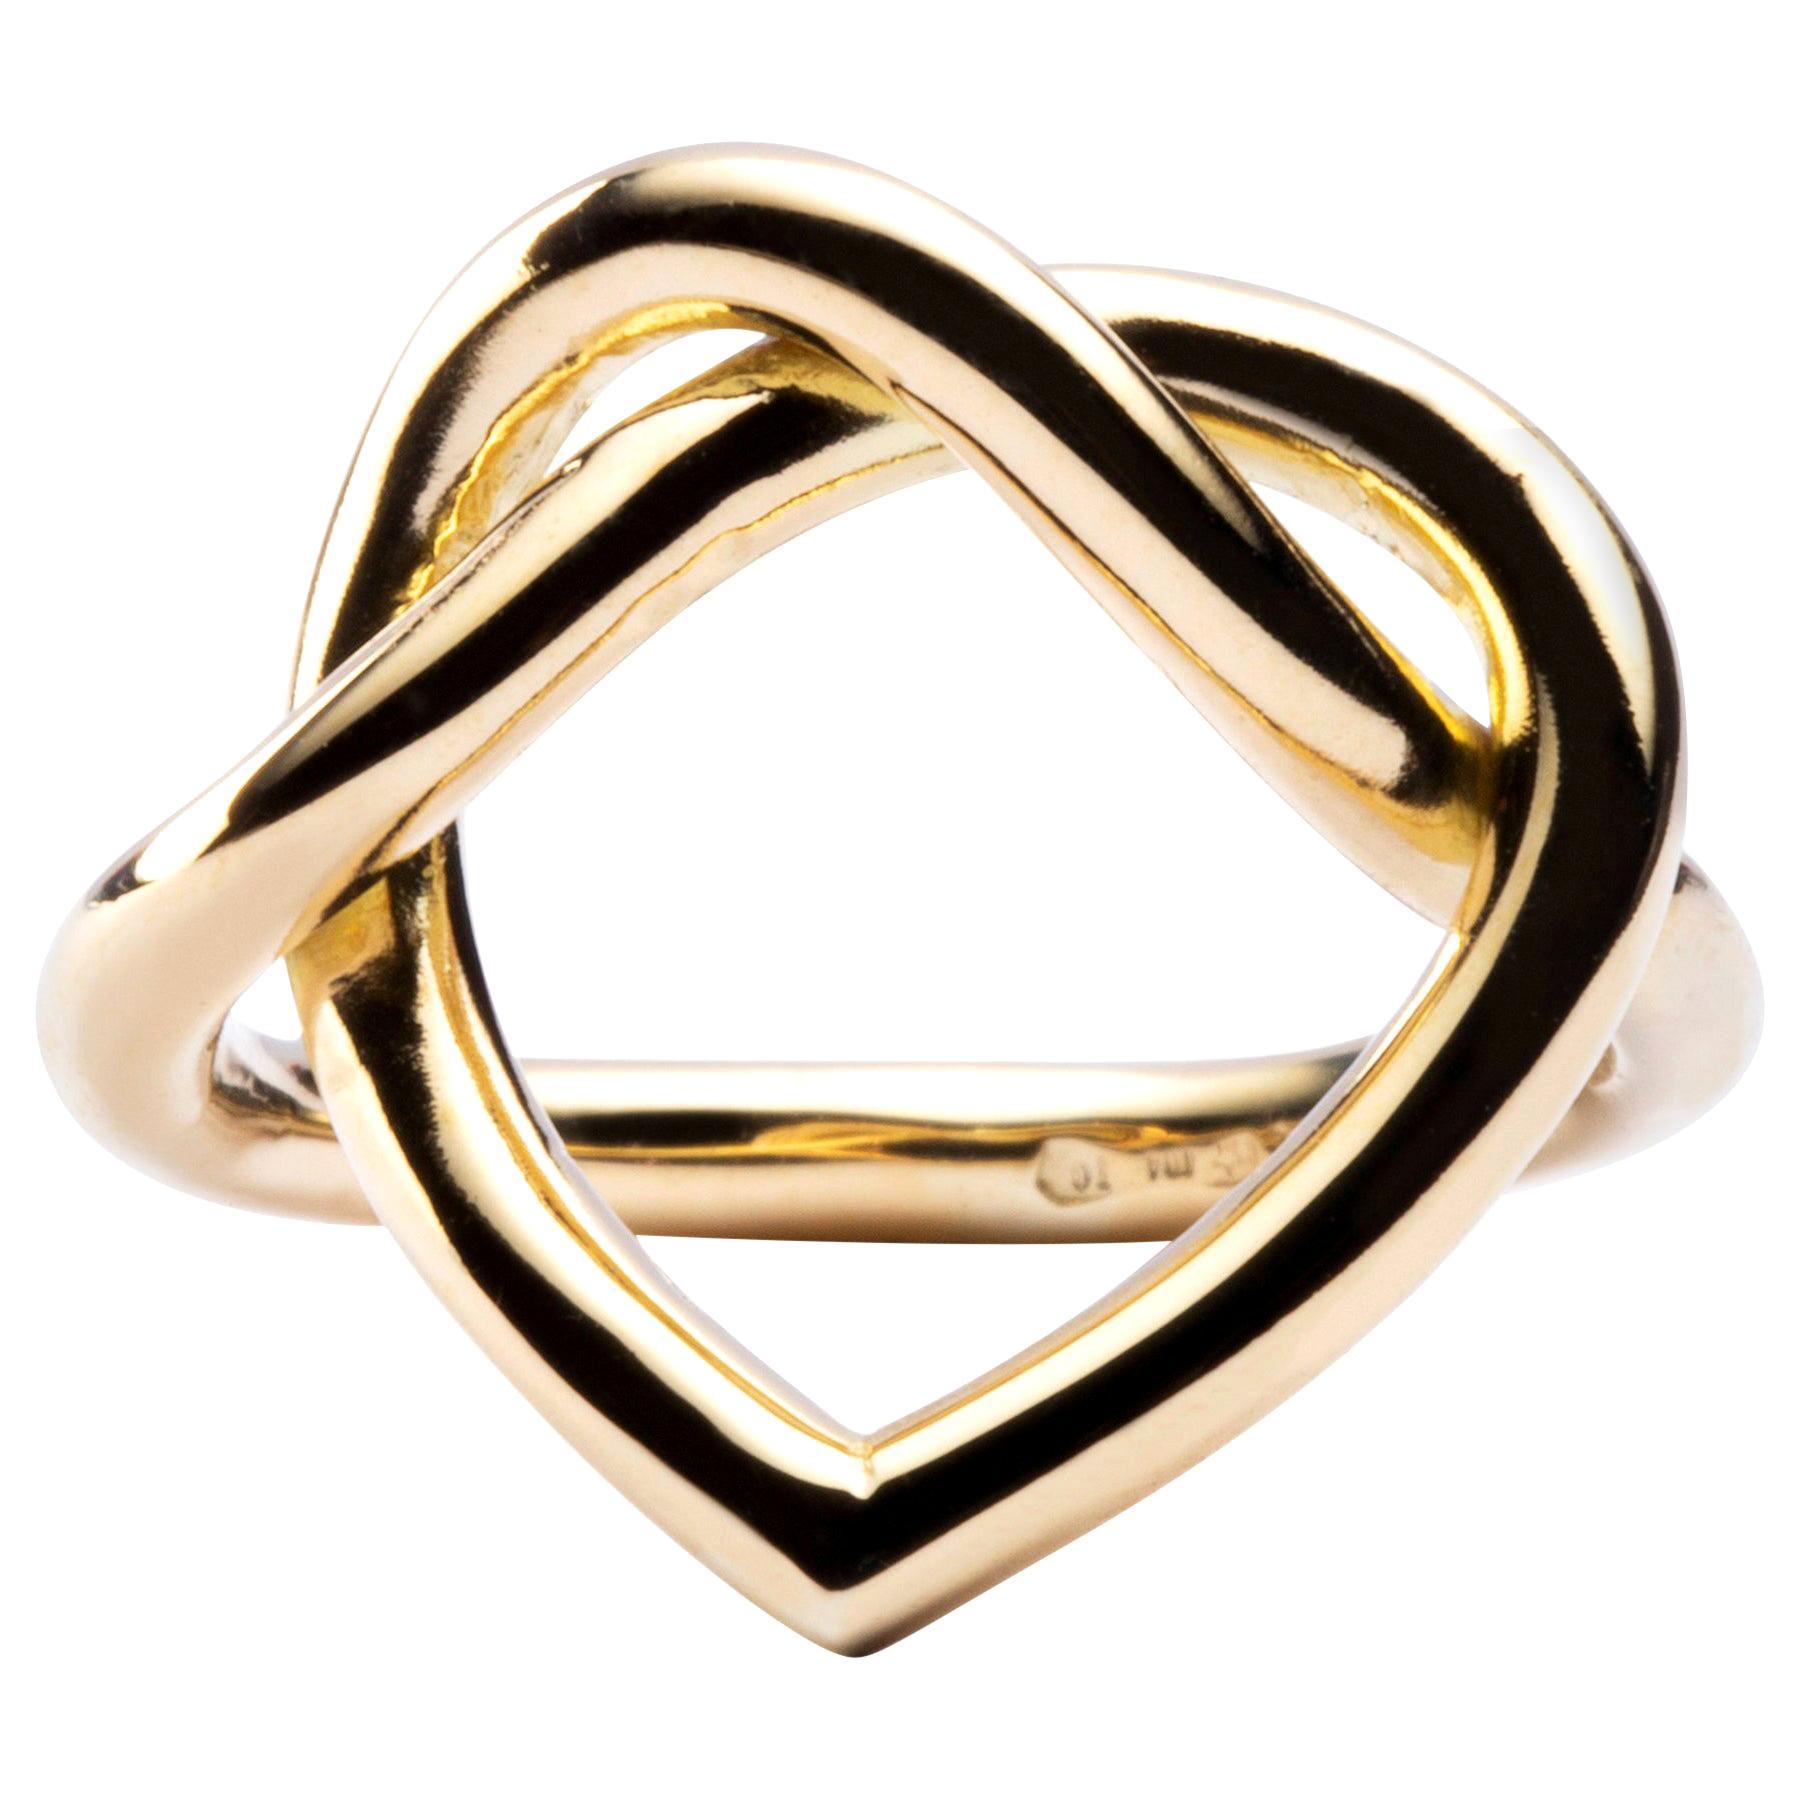 Jona Open Heart 18 Karat Yellow Gold Ring